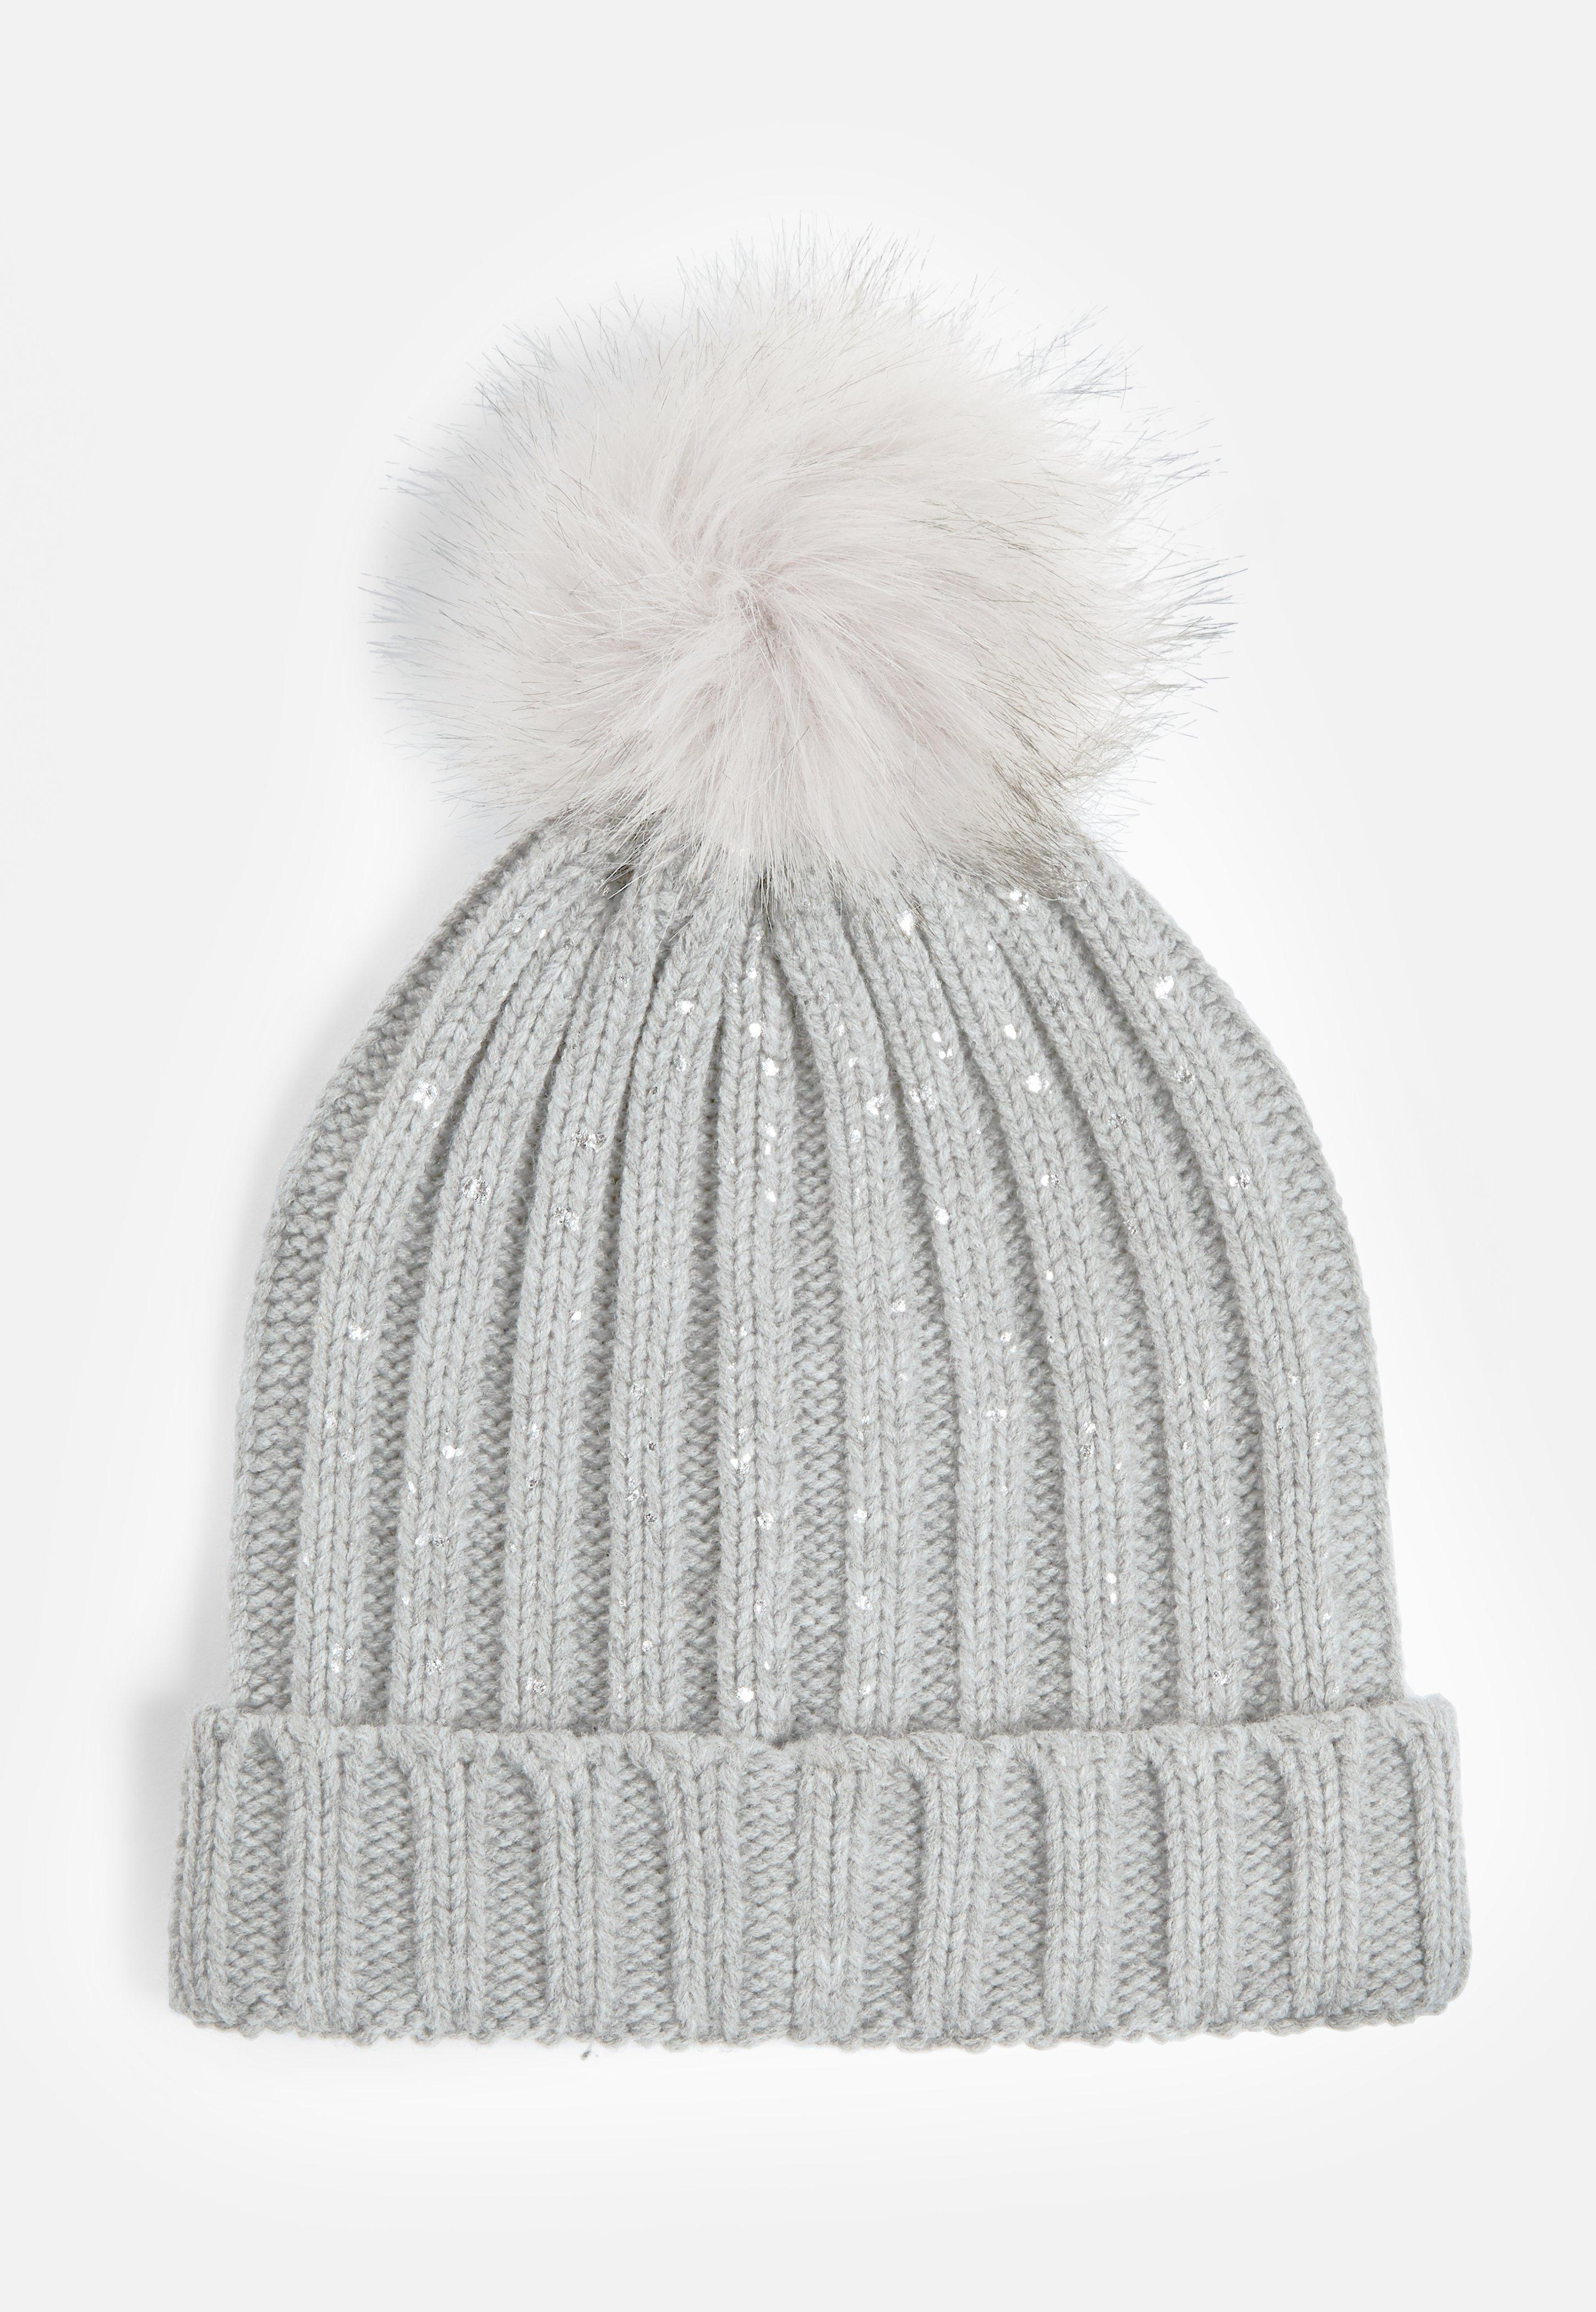 69a51cd9549 Lyst - Missguided Grey Metallic Faux Fur Pom Pom Beanie Hat in Gray